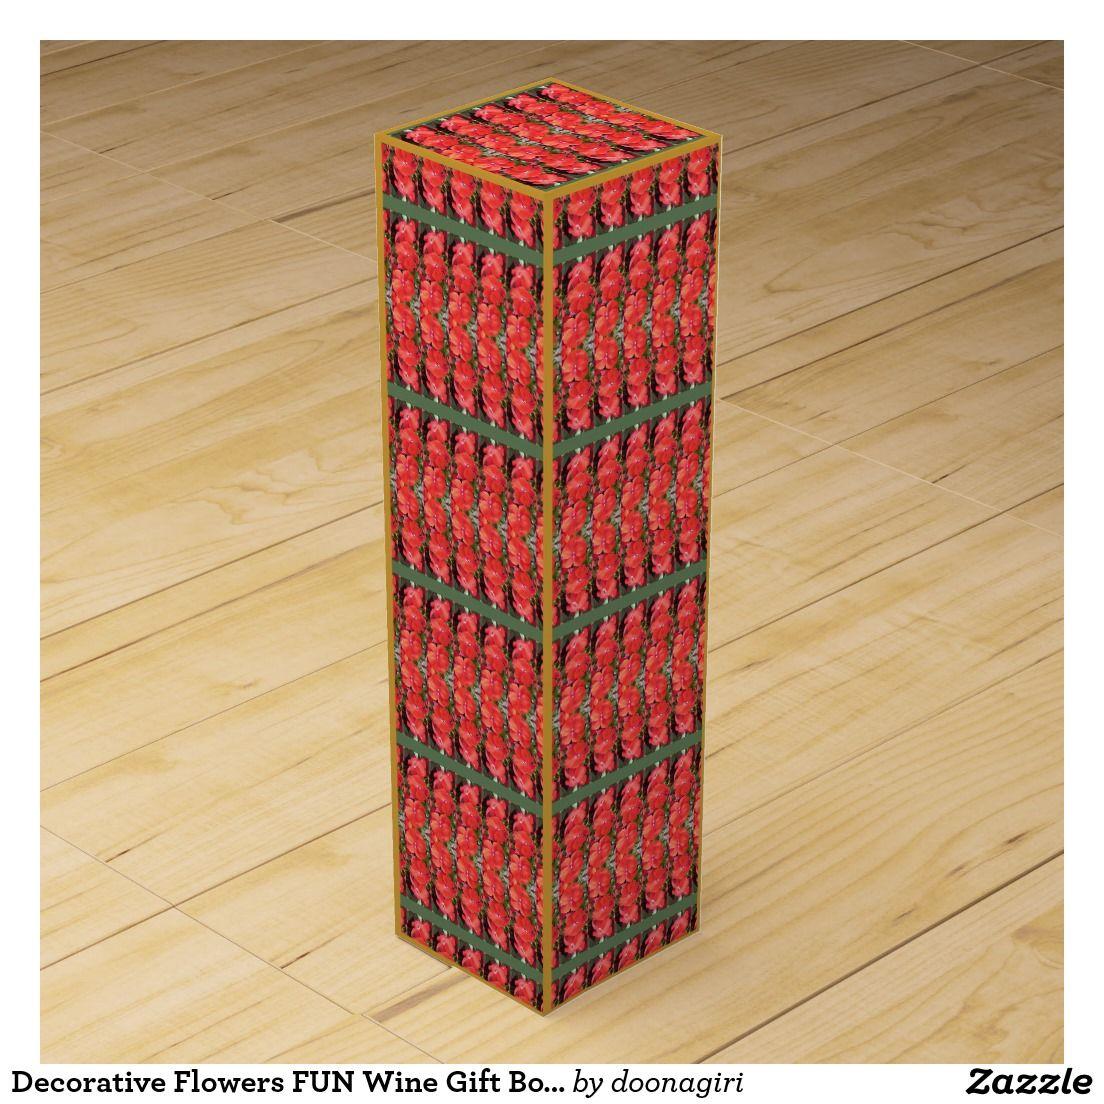 Decorative Flowers Fun Wine Gift Box Navinjoshi Zazzle Com 101